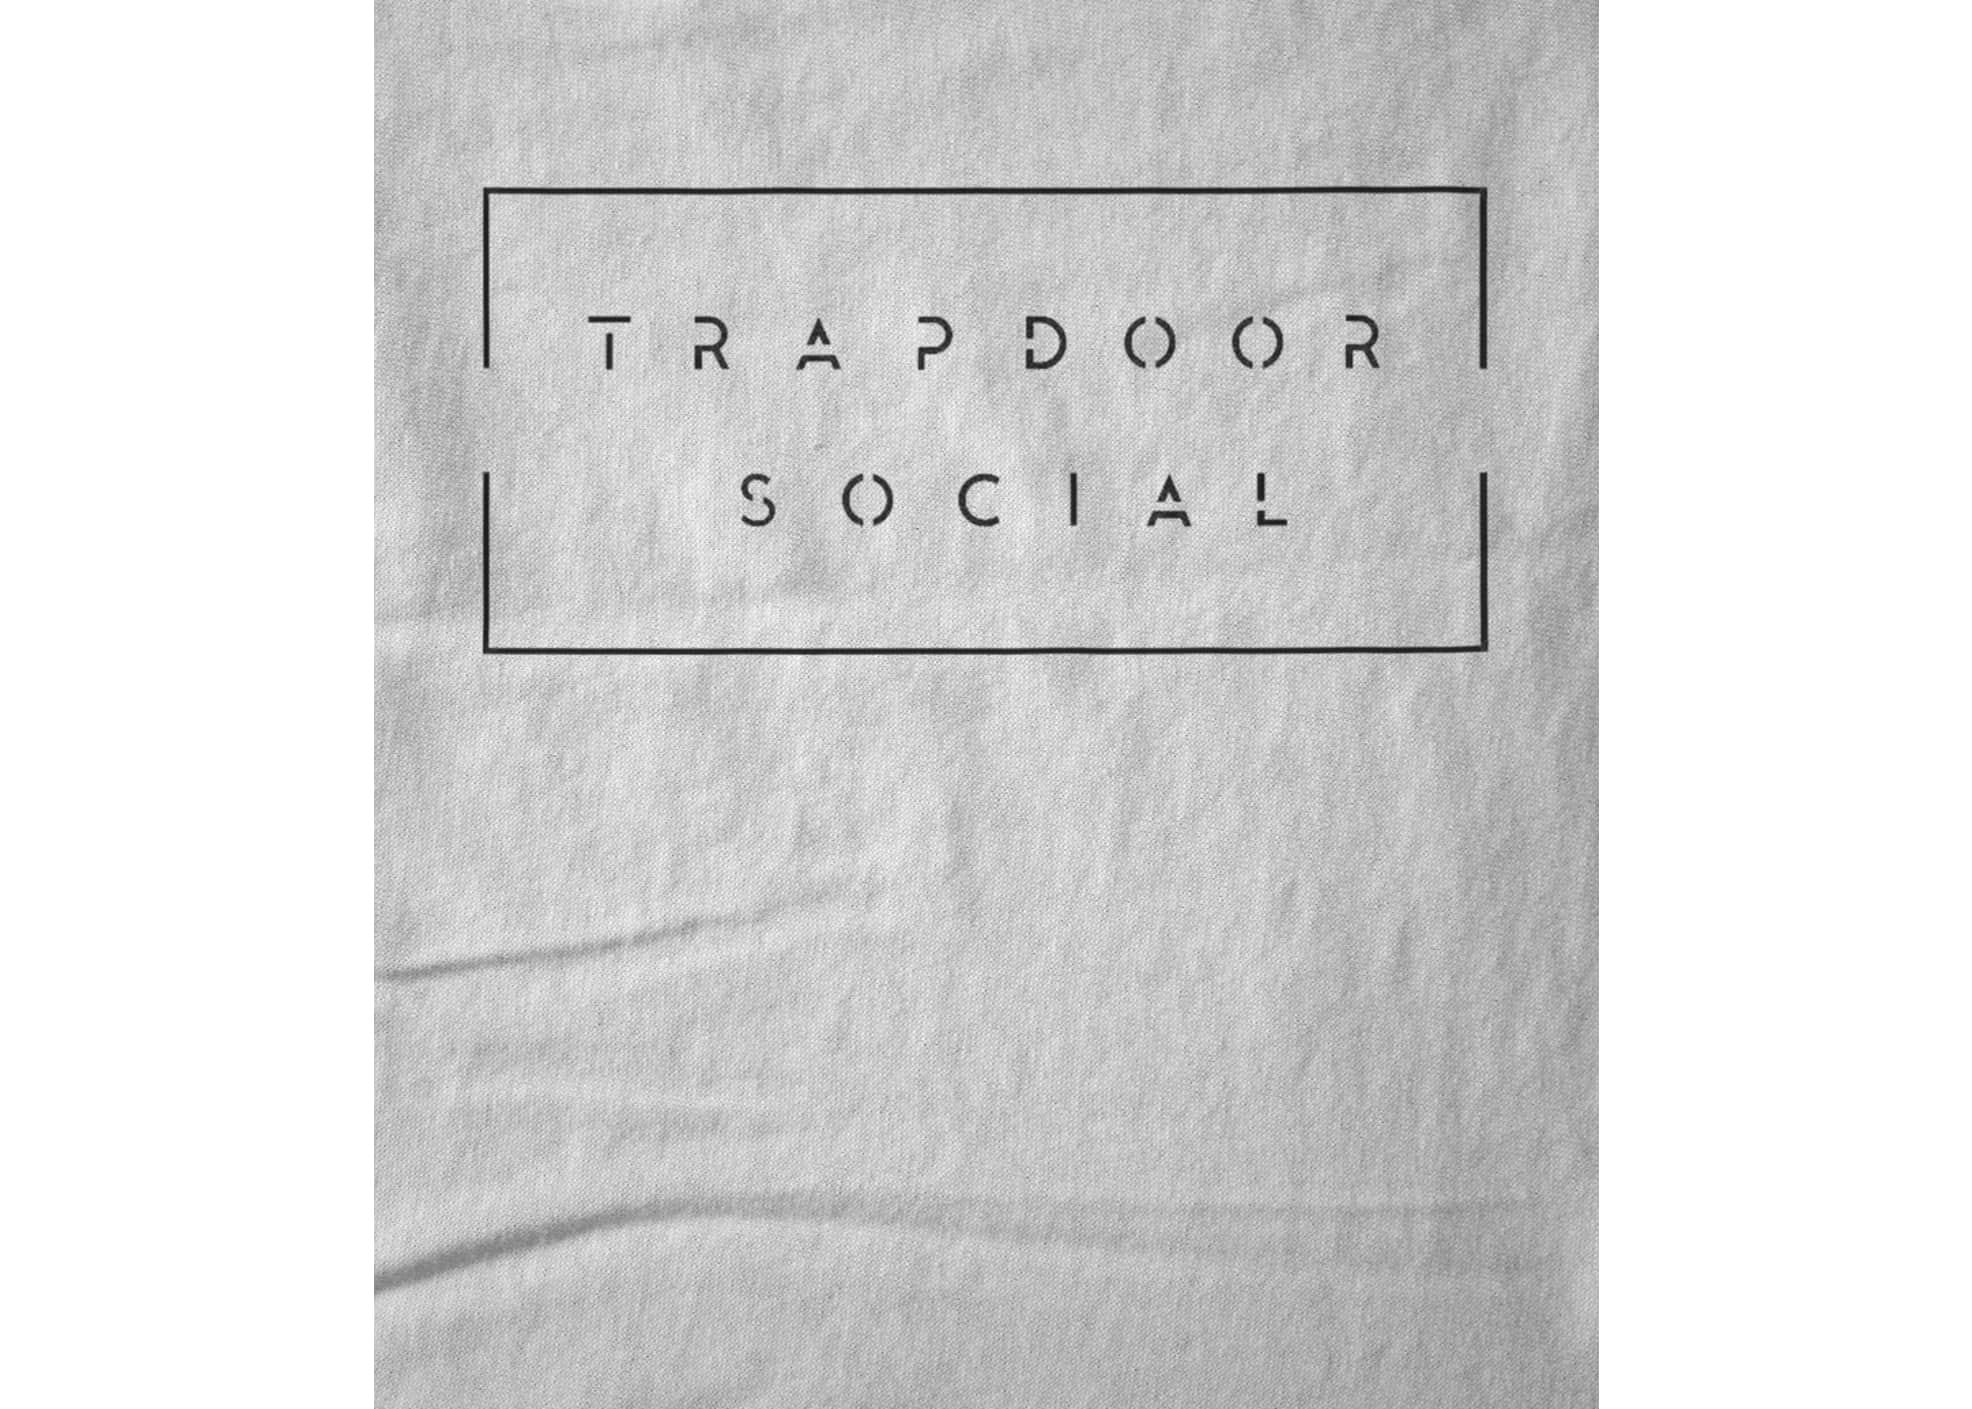 Trapdoor social white band logo 1476398886